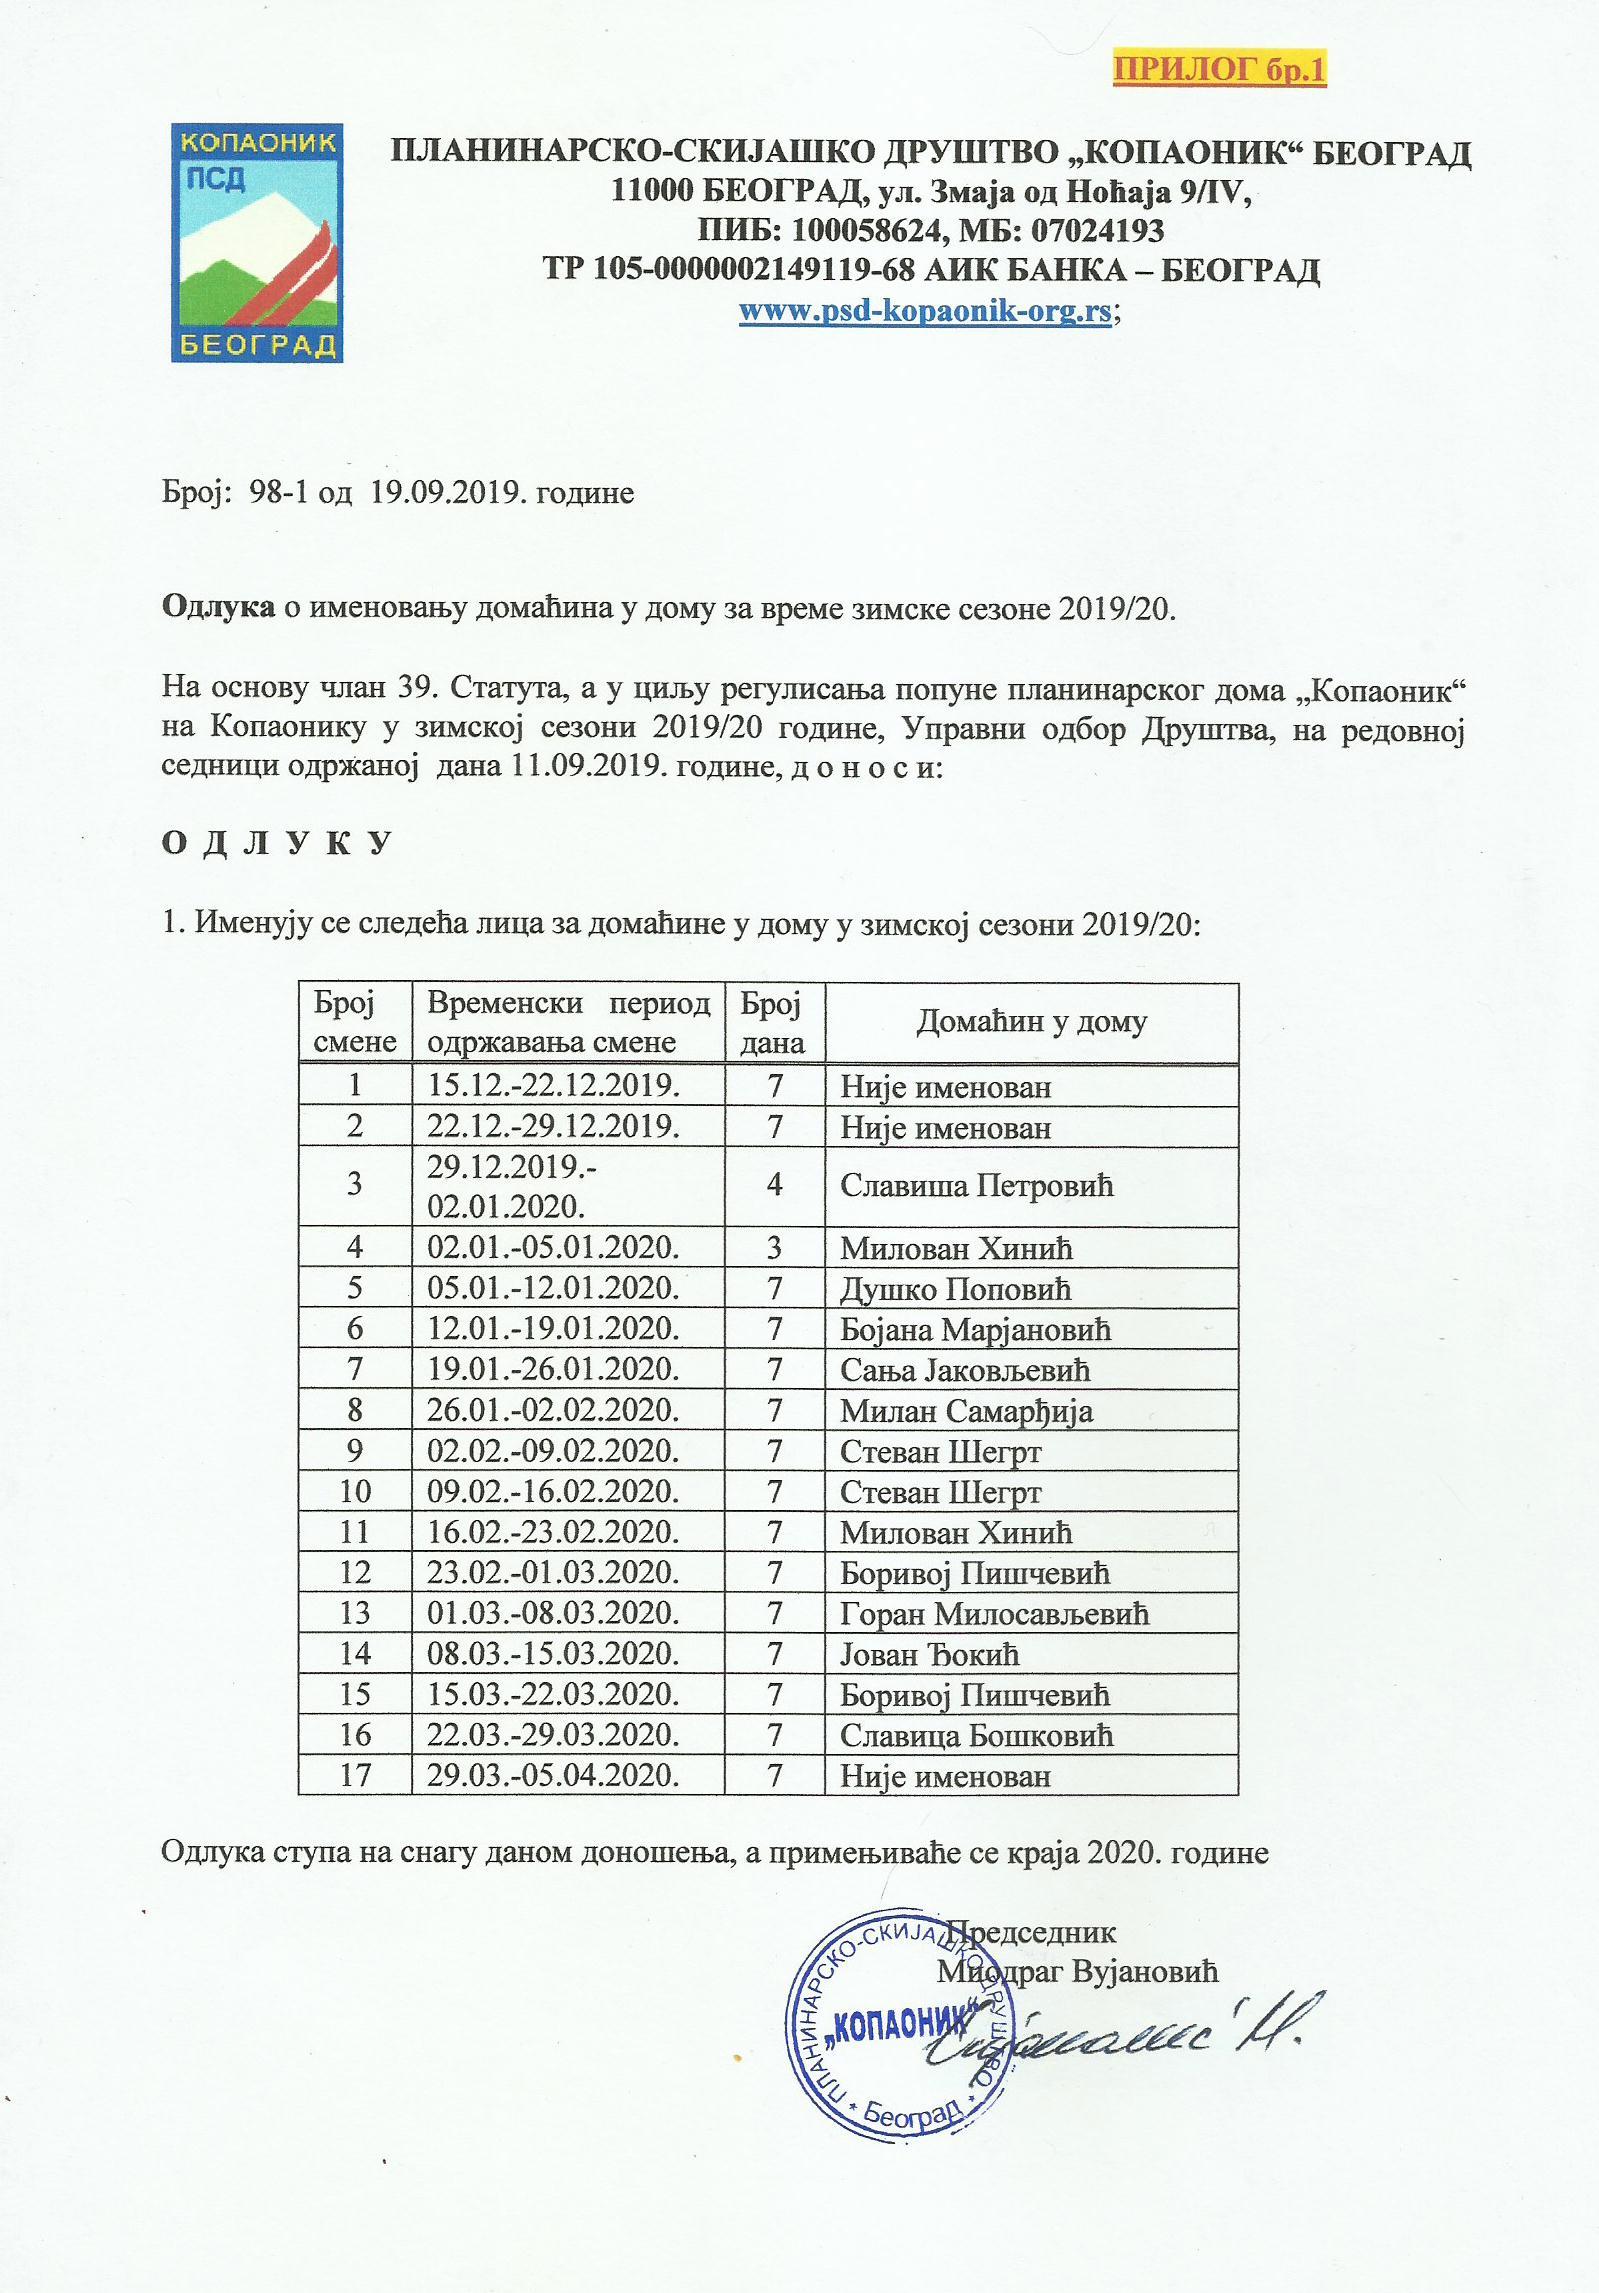 2019_Odluka_UO_o_vodjama_smena_za_2019_i_2020.docx.jpg - 410,96 kB